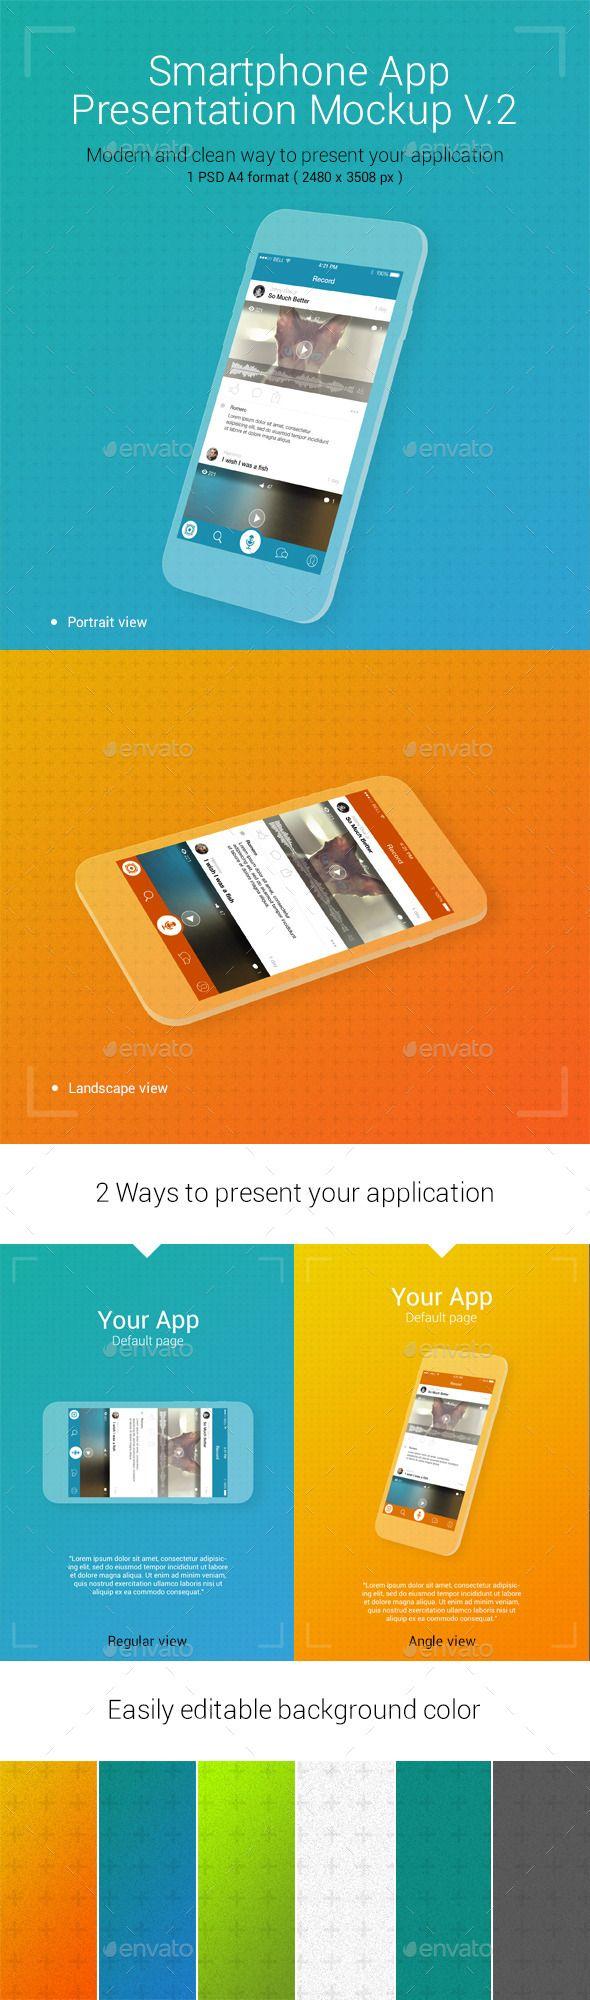 App Presentation Mockup V.2 — Photoshop PSD #easy #bg • Available here → https://graphicriver.net/item/app-presentation-mockup-v2/12959870?ref=pxcr